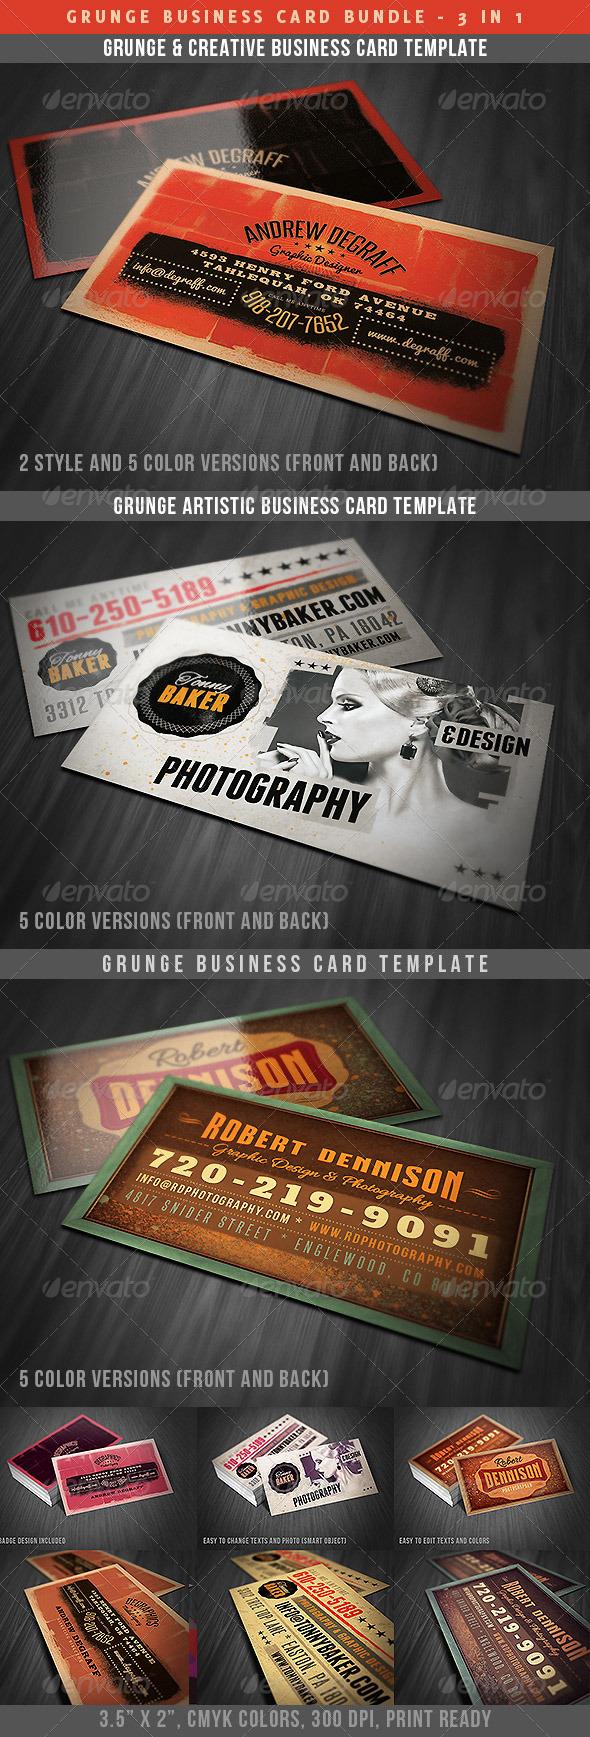 GraphicRiver Grunge Business Cards Bundle 4747683